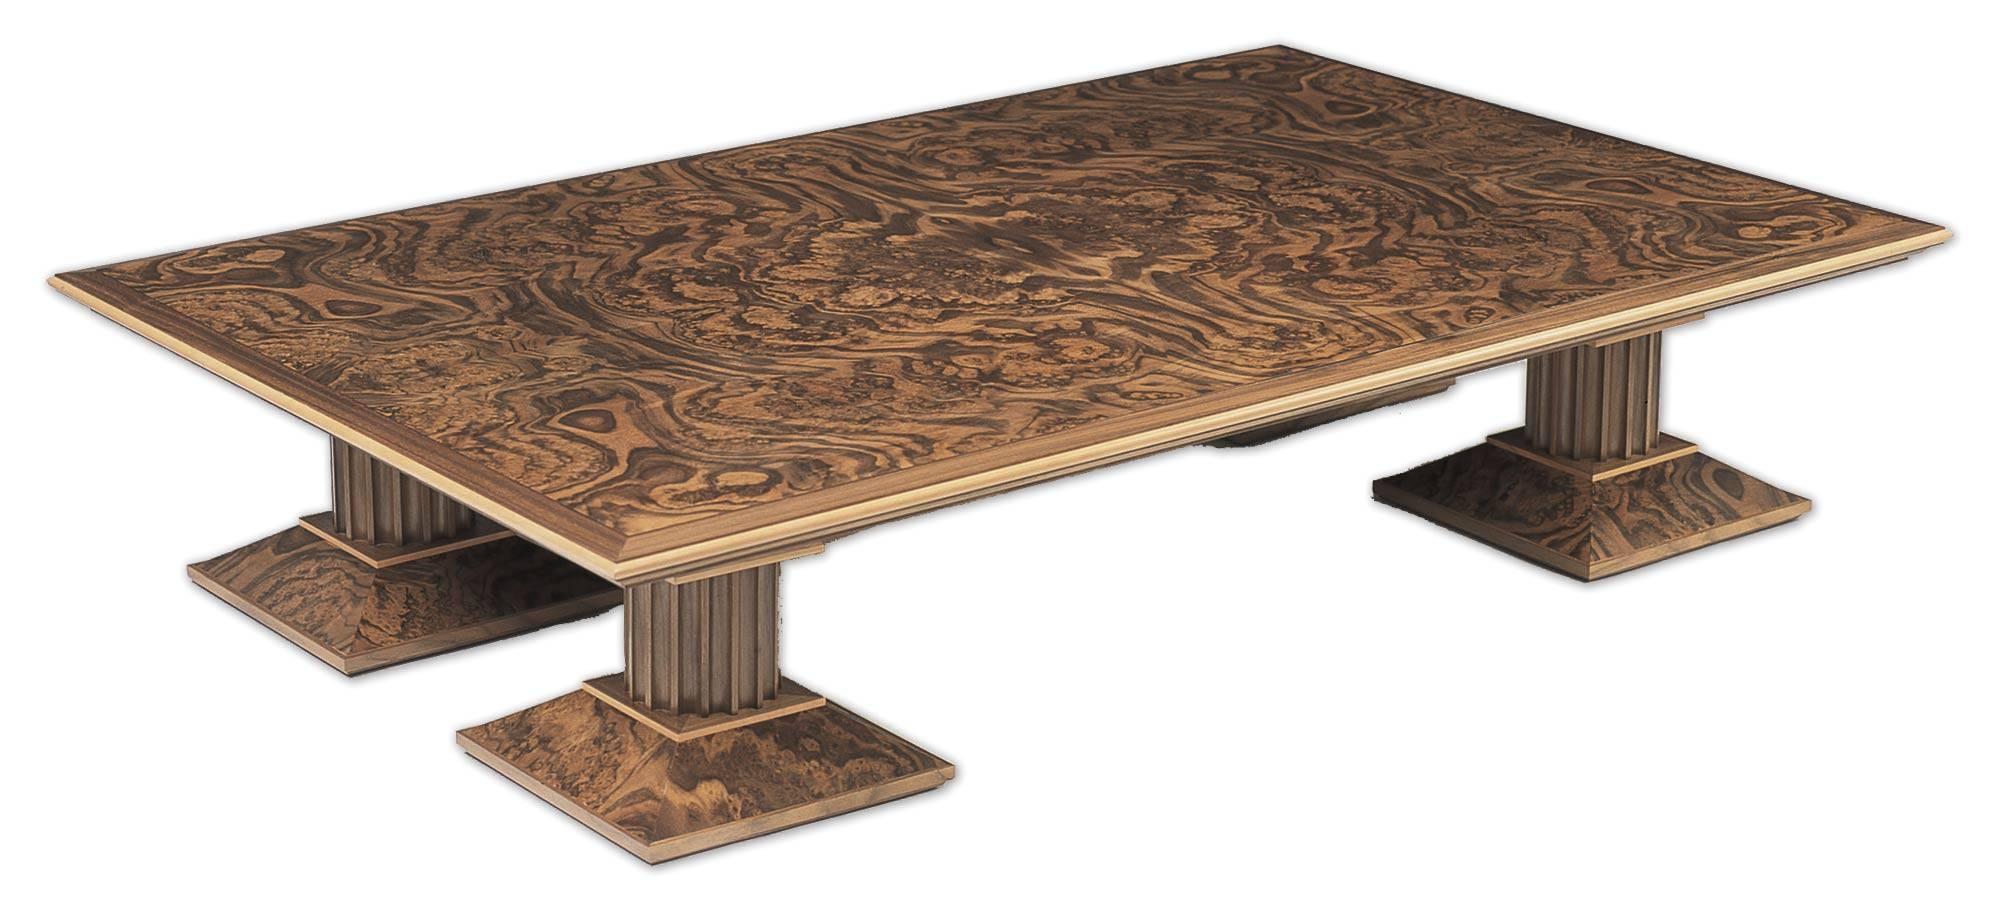 Bespoke Coffee Table In Walnut | Makers' Eye throughout Bespoke Coffee Tables (Image 5 of 30)